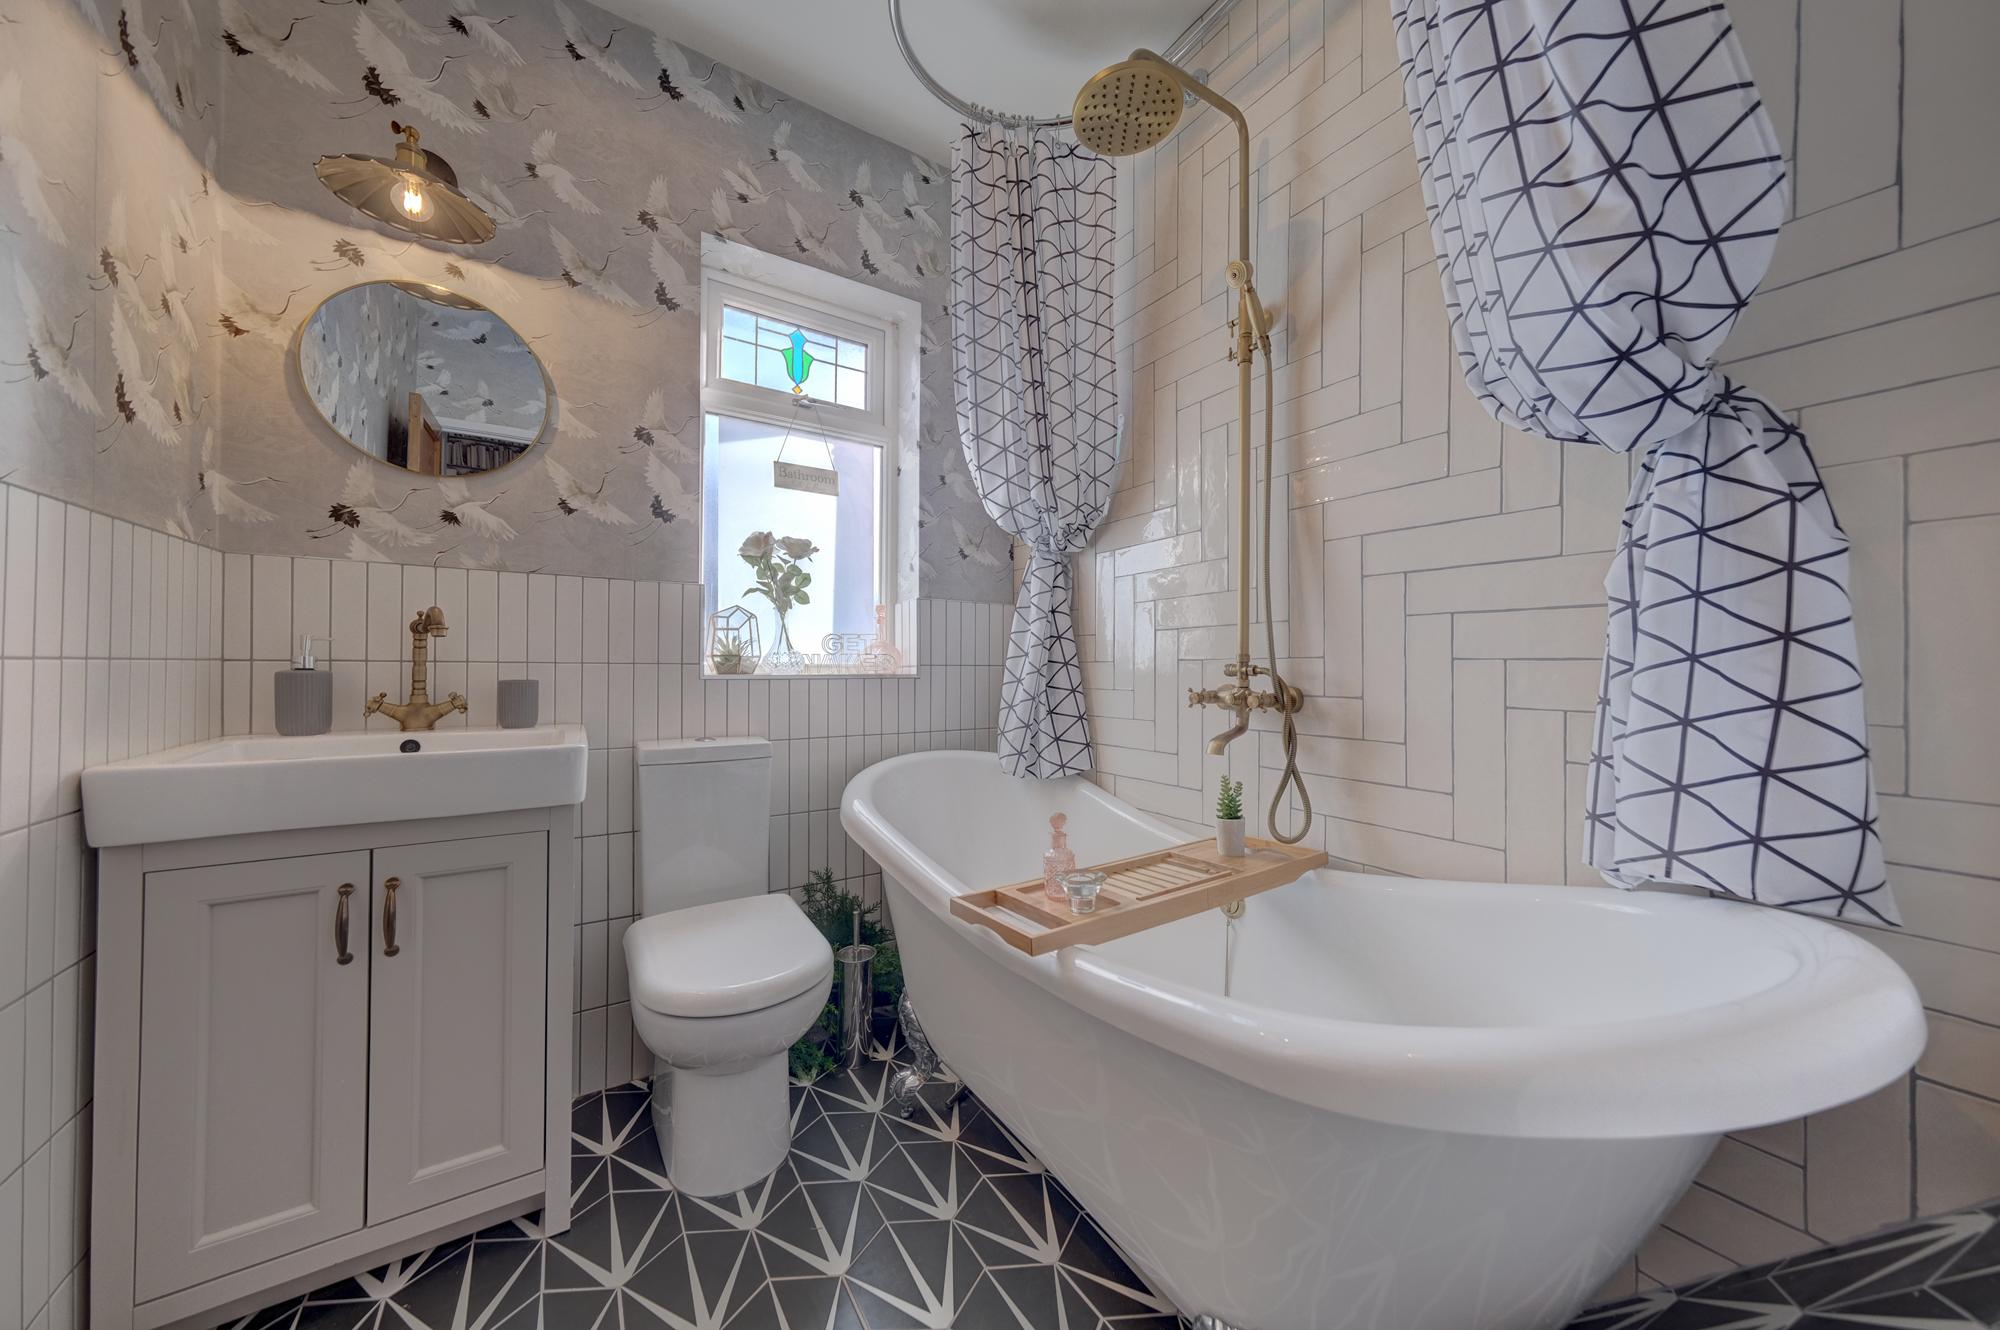 Priesthills Road - A success story - luxury bathroom